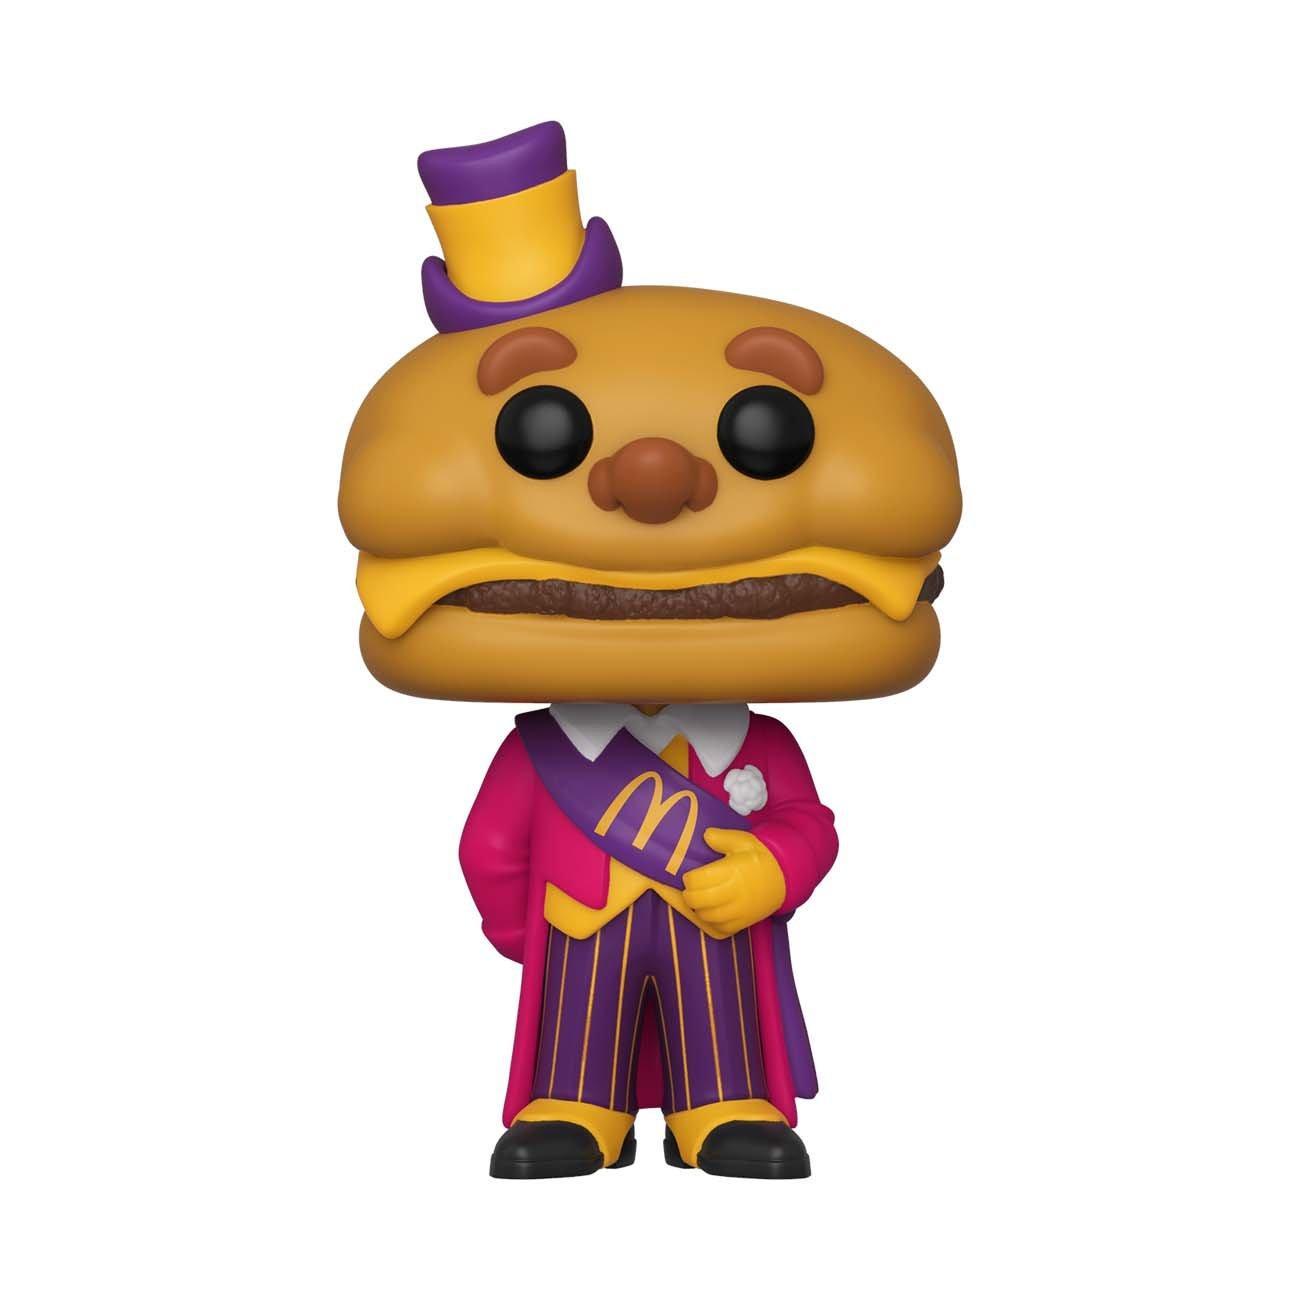 Pop Ad Icons Mcdonald S Mayor Mccheese Gamestop With professor ronald mcdonald hamburgular mayor mccheese sheriff bigmac hamburgular grimace captain crook. pop ad icons mcdonald s mayor mccheese gamestop